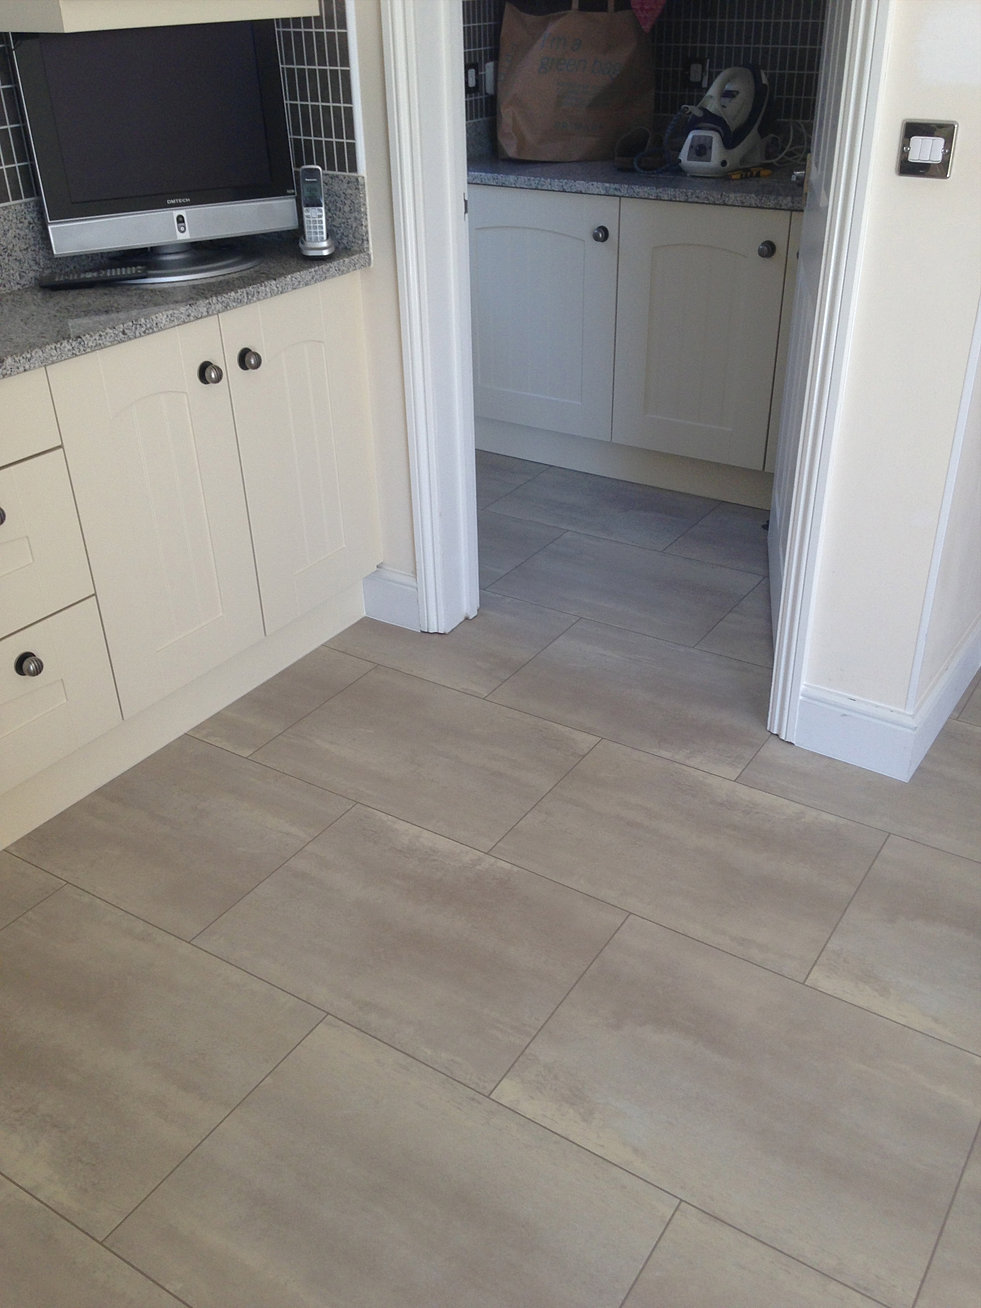 Floorsmk hard wood flooring amtico karndean laminate karndean opus urbus sp213 dailygadgetfo Images